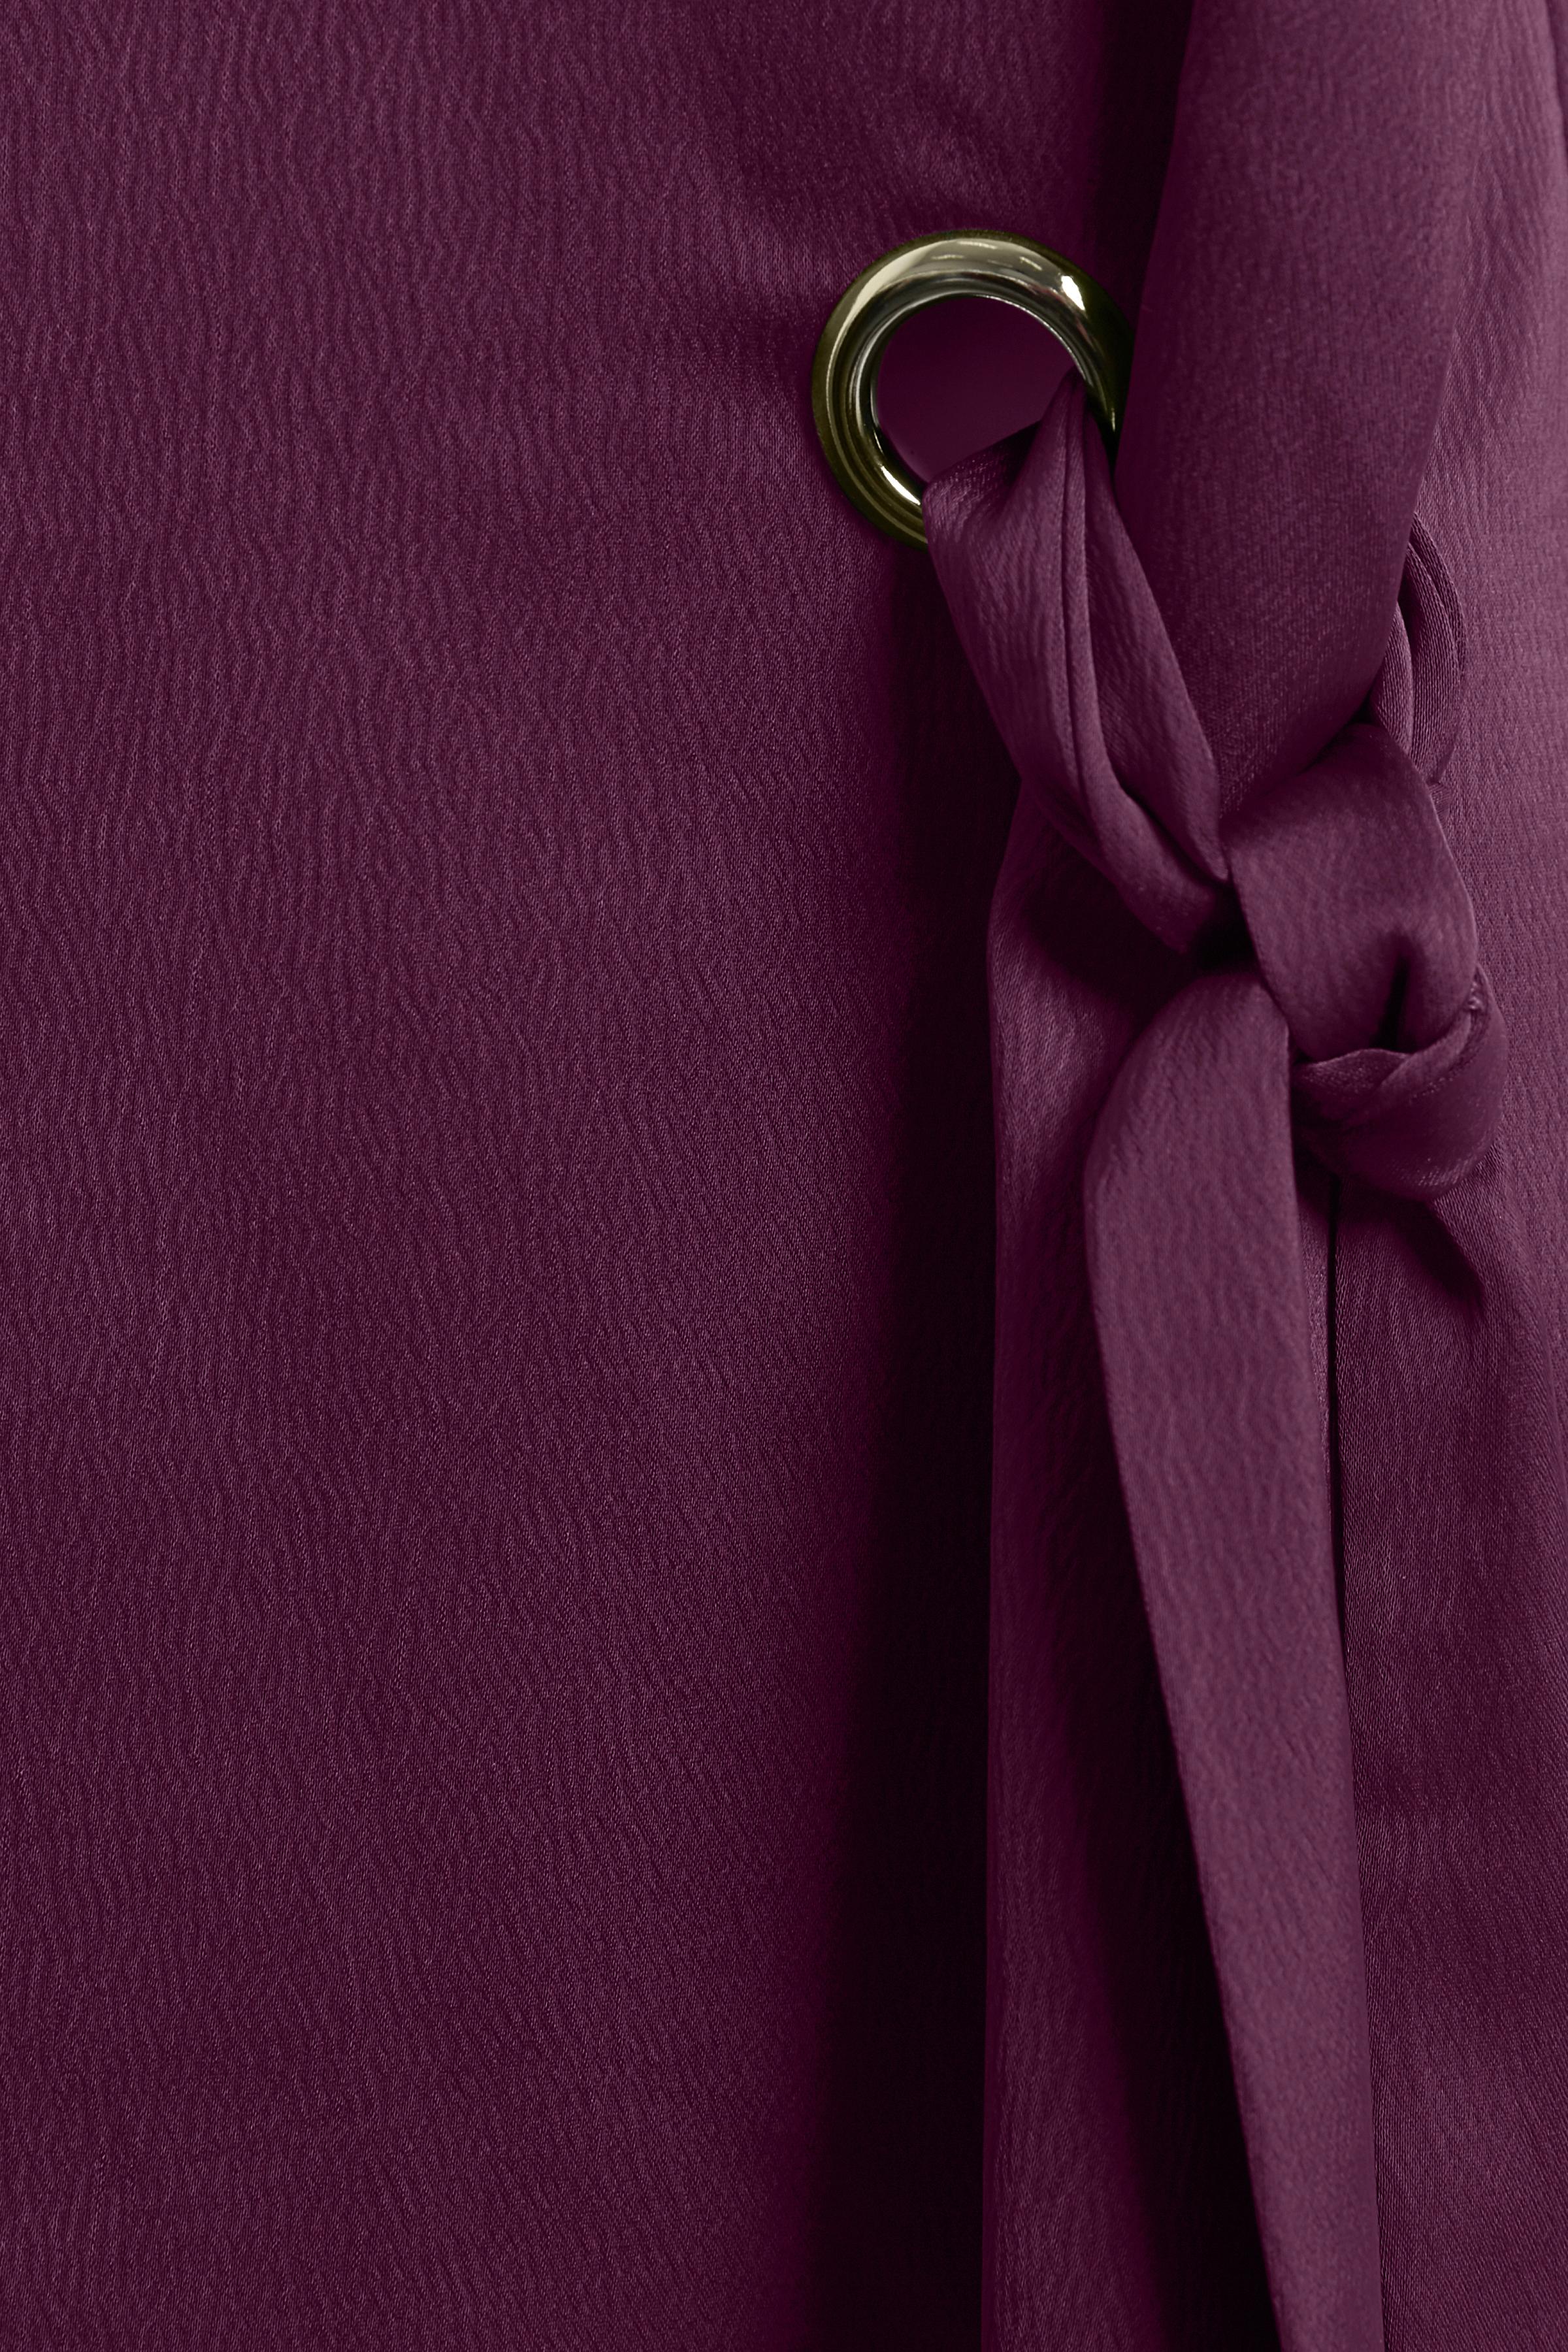 Mørk aubergine Kortærmet bluse fra Bon'A Parte – Køb Mørk aubergine Kortærmet bluse fra str. S-2XL her